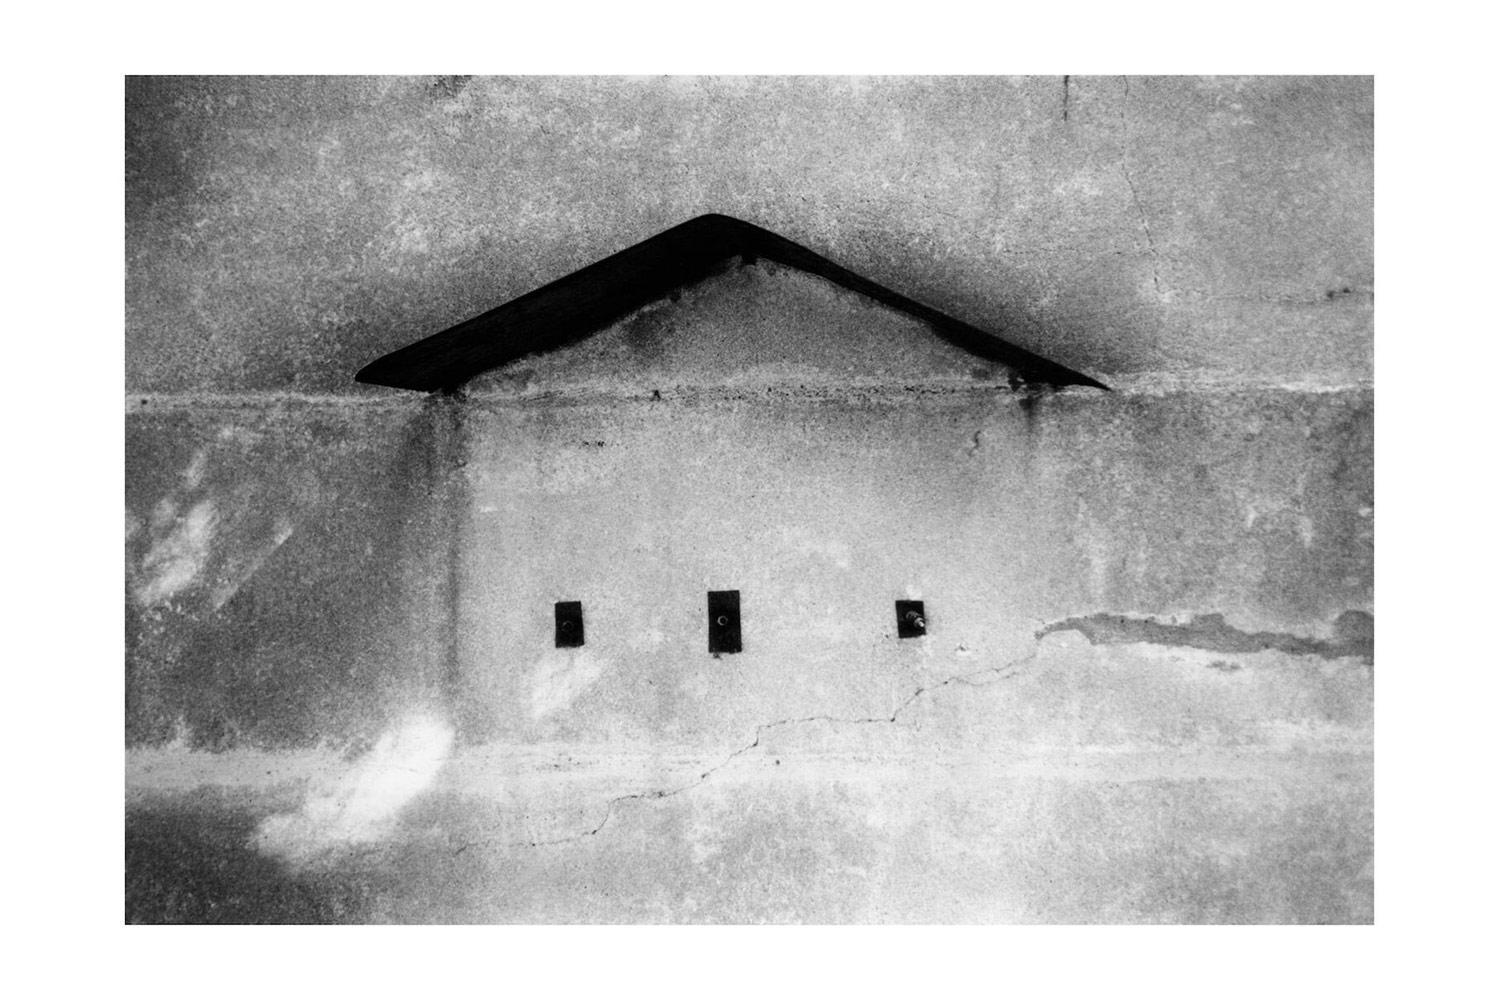 Spuren der Vergangenheit, © Silke Krah, Photography and Literature Photography Competition